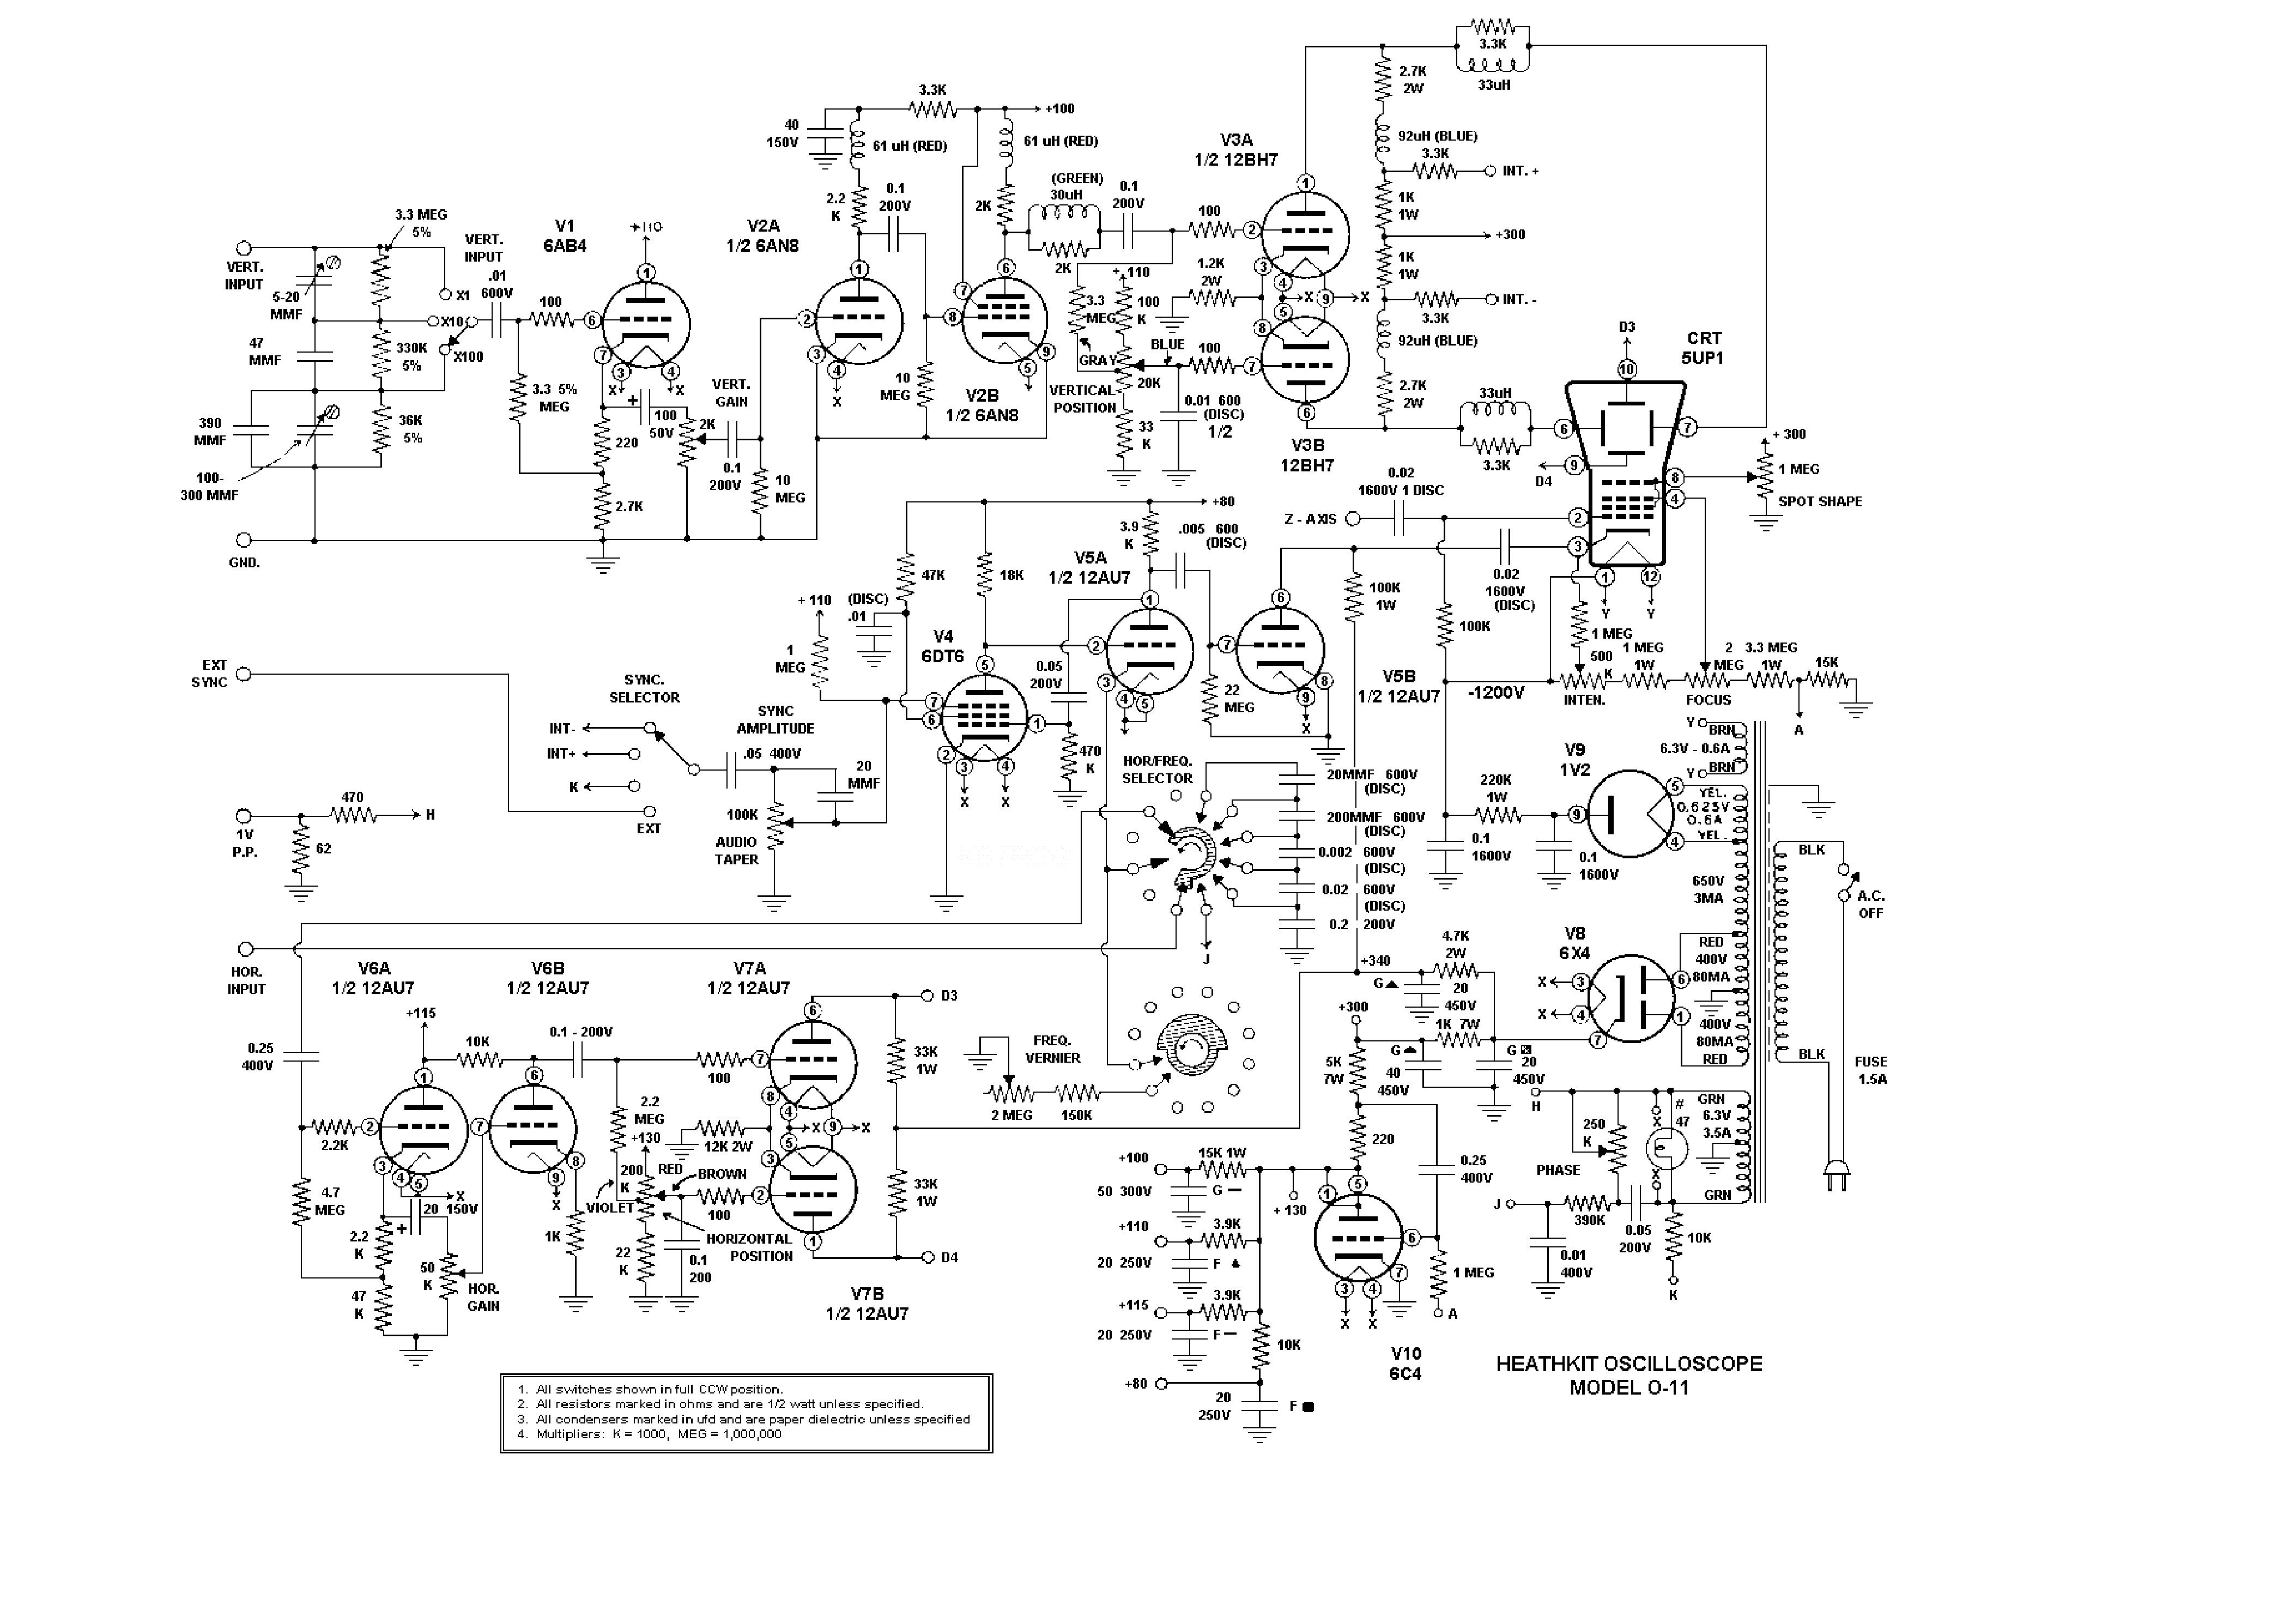 Heathkit O11 Oscilloscope Sch Service Manual Download